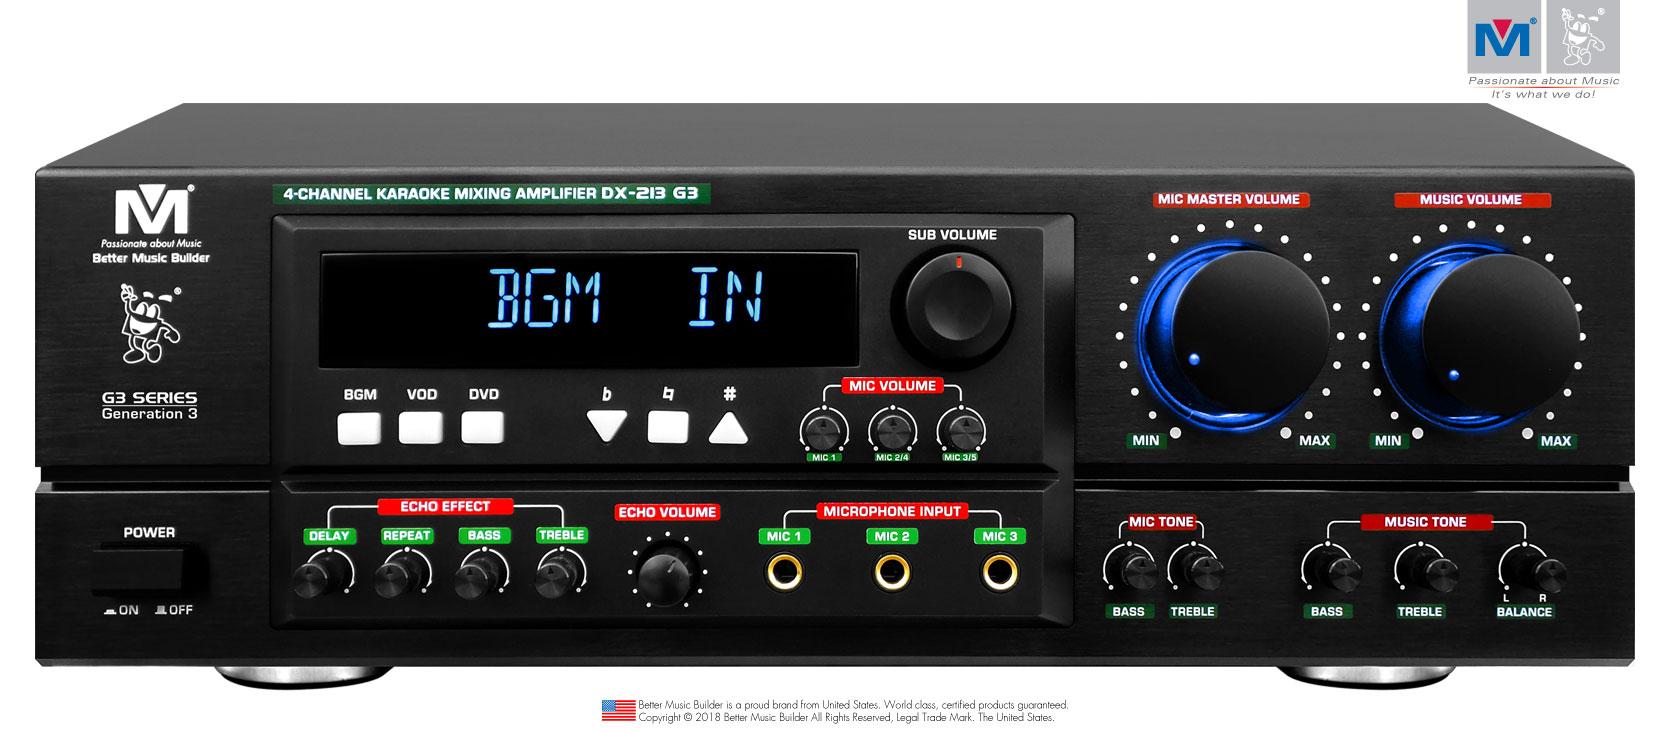 Better Music Builder (M) DX-213 G3 800W Professional Mixing Amplifier